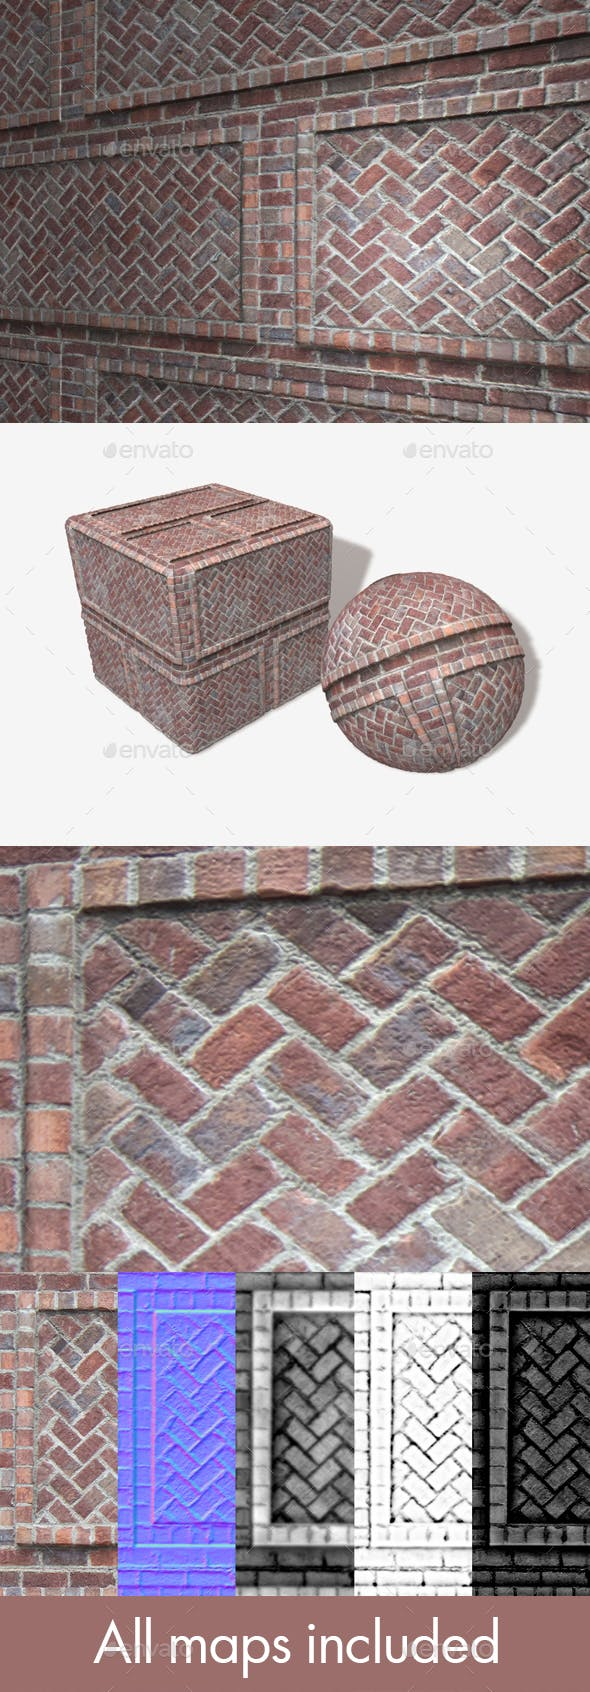 Brick Decoration Seamless Texture - 3DOcean Item for Sale